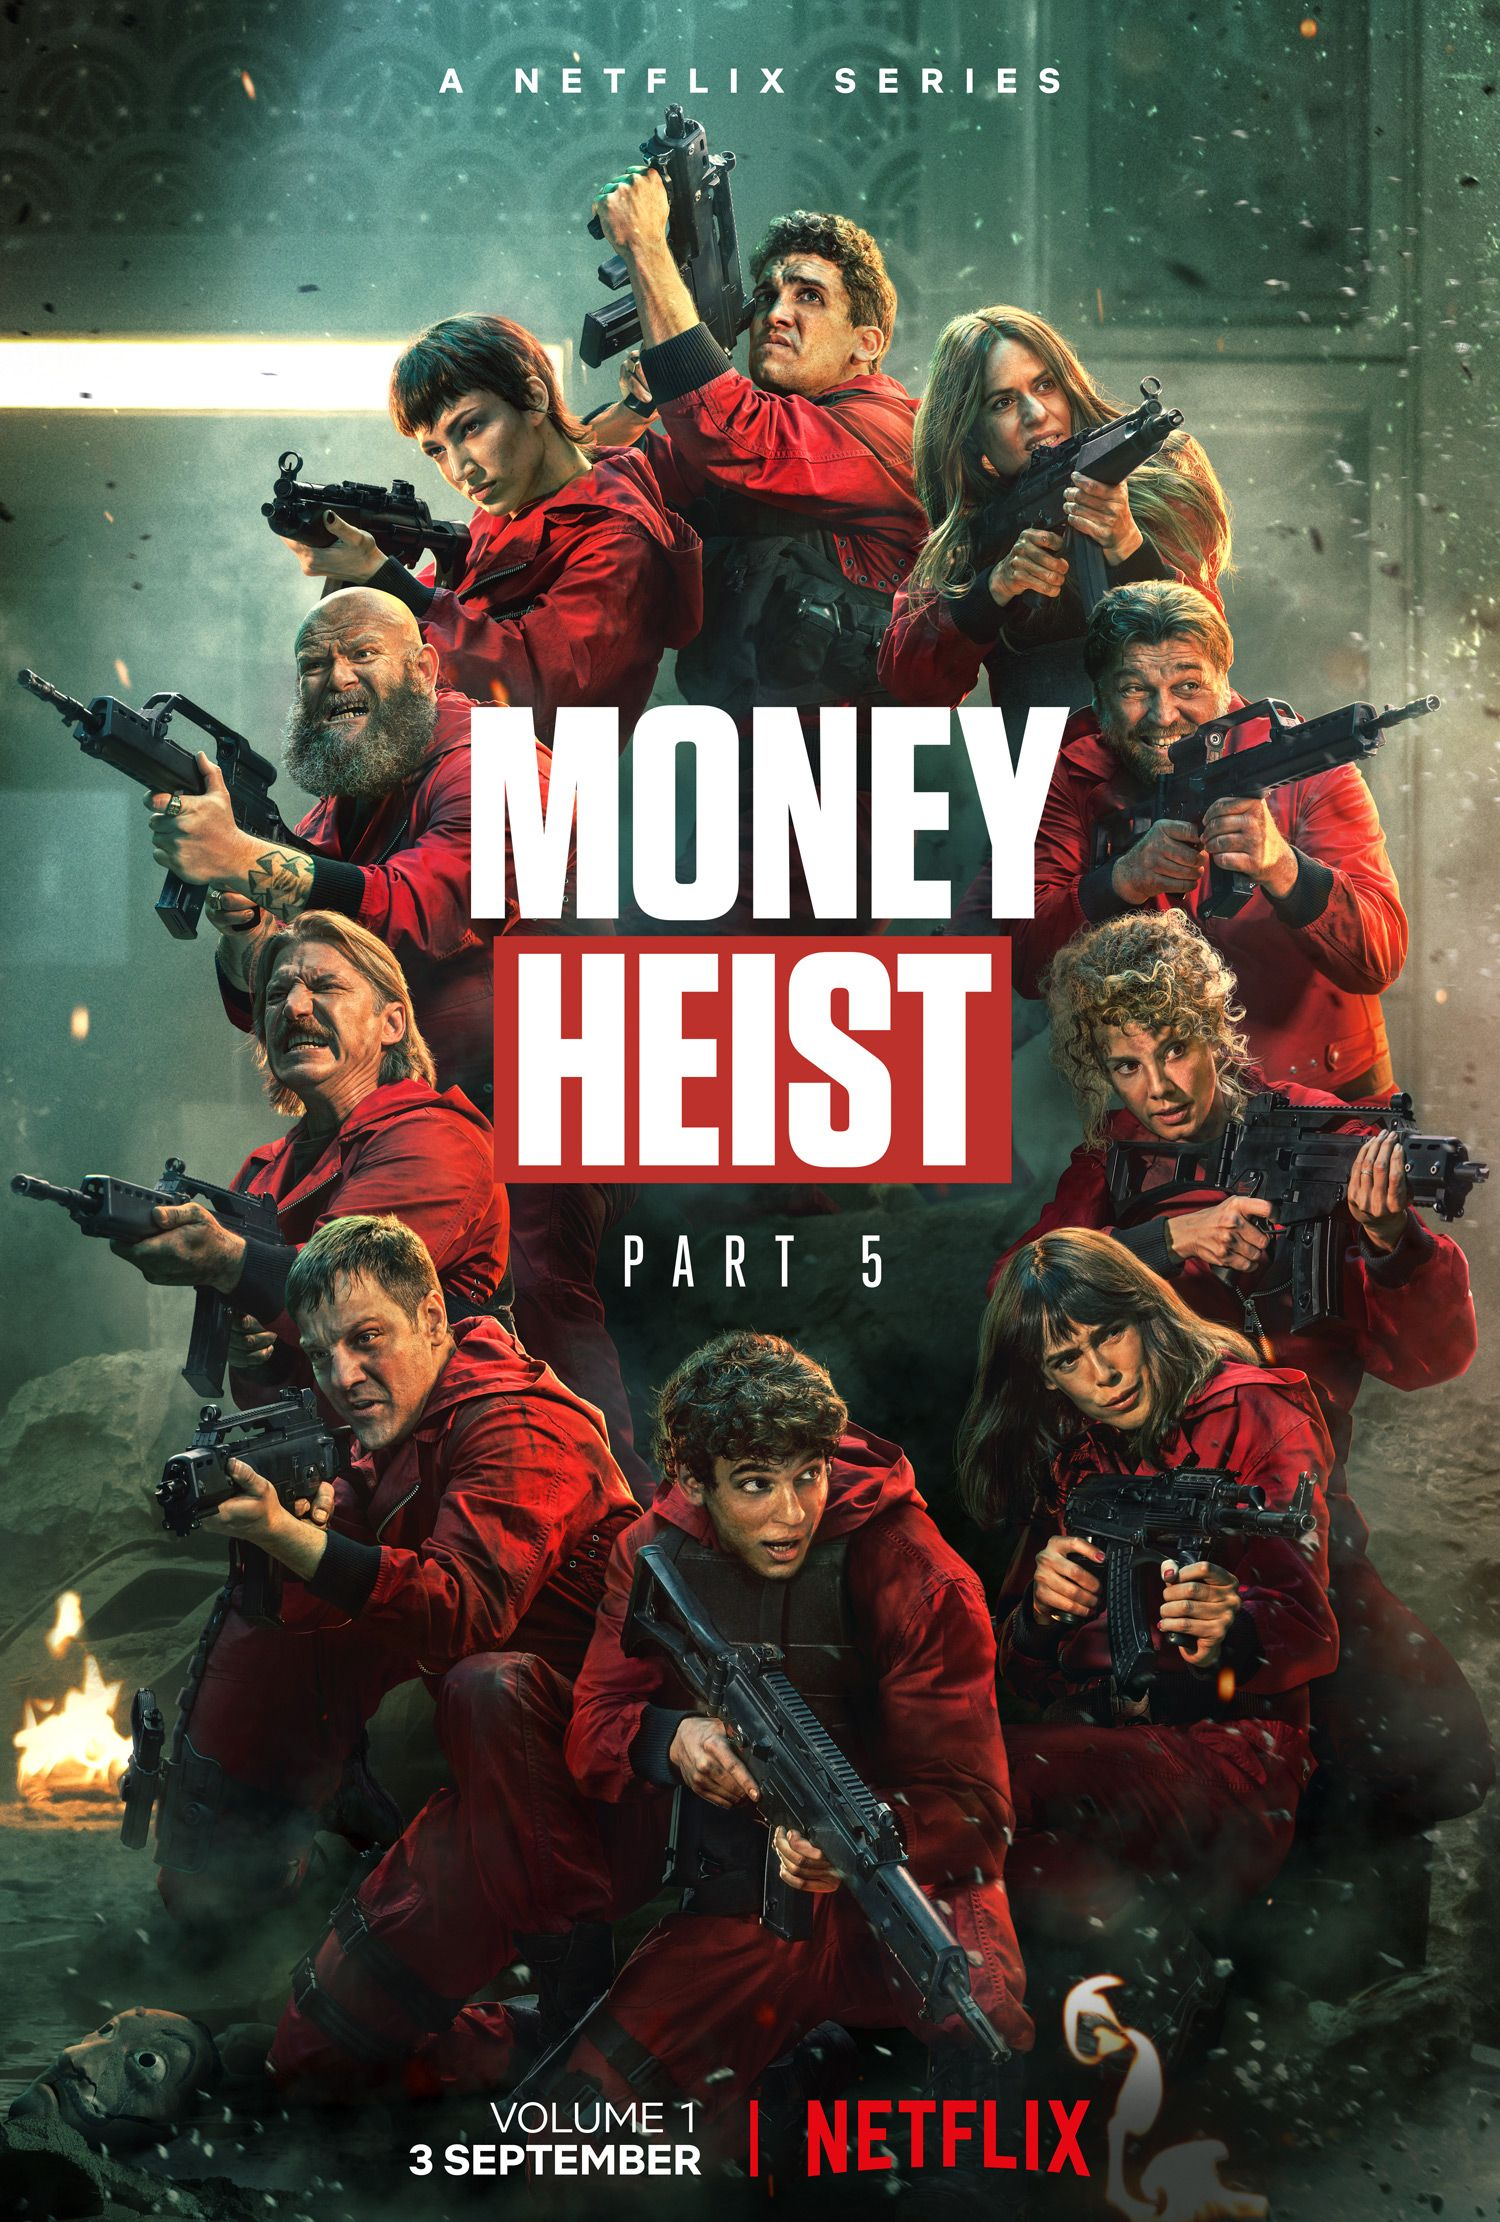 Money Heist Season 5 Episode 1-5 (Volume 1)